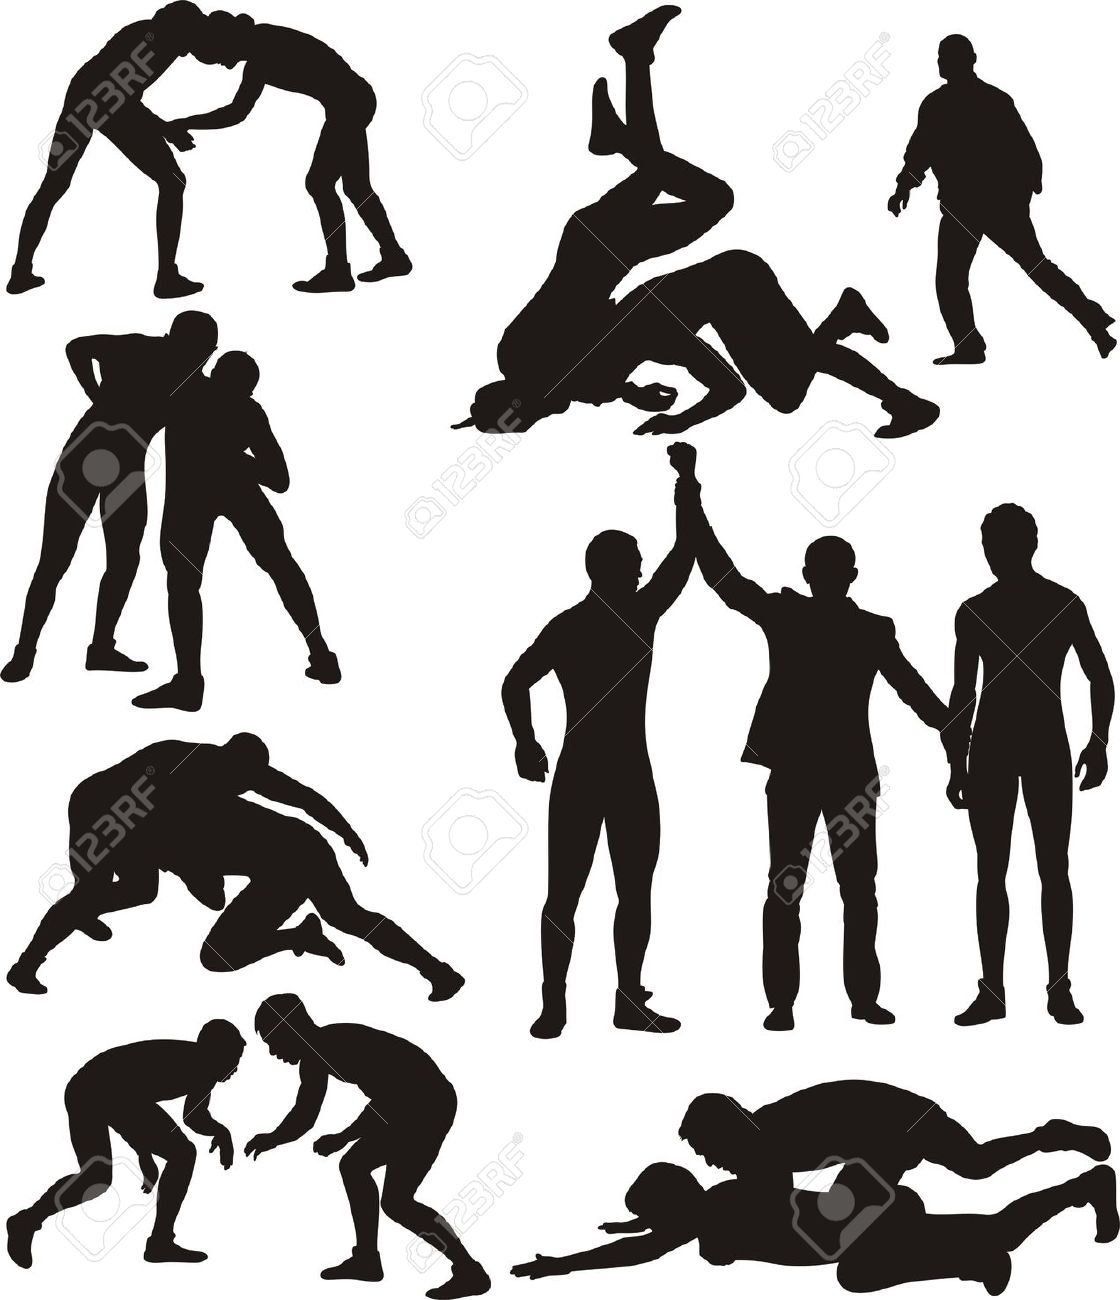 Wrestling wrestler cliparts